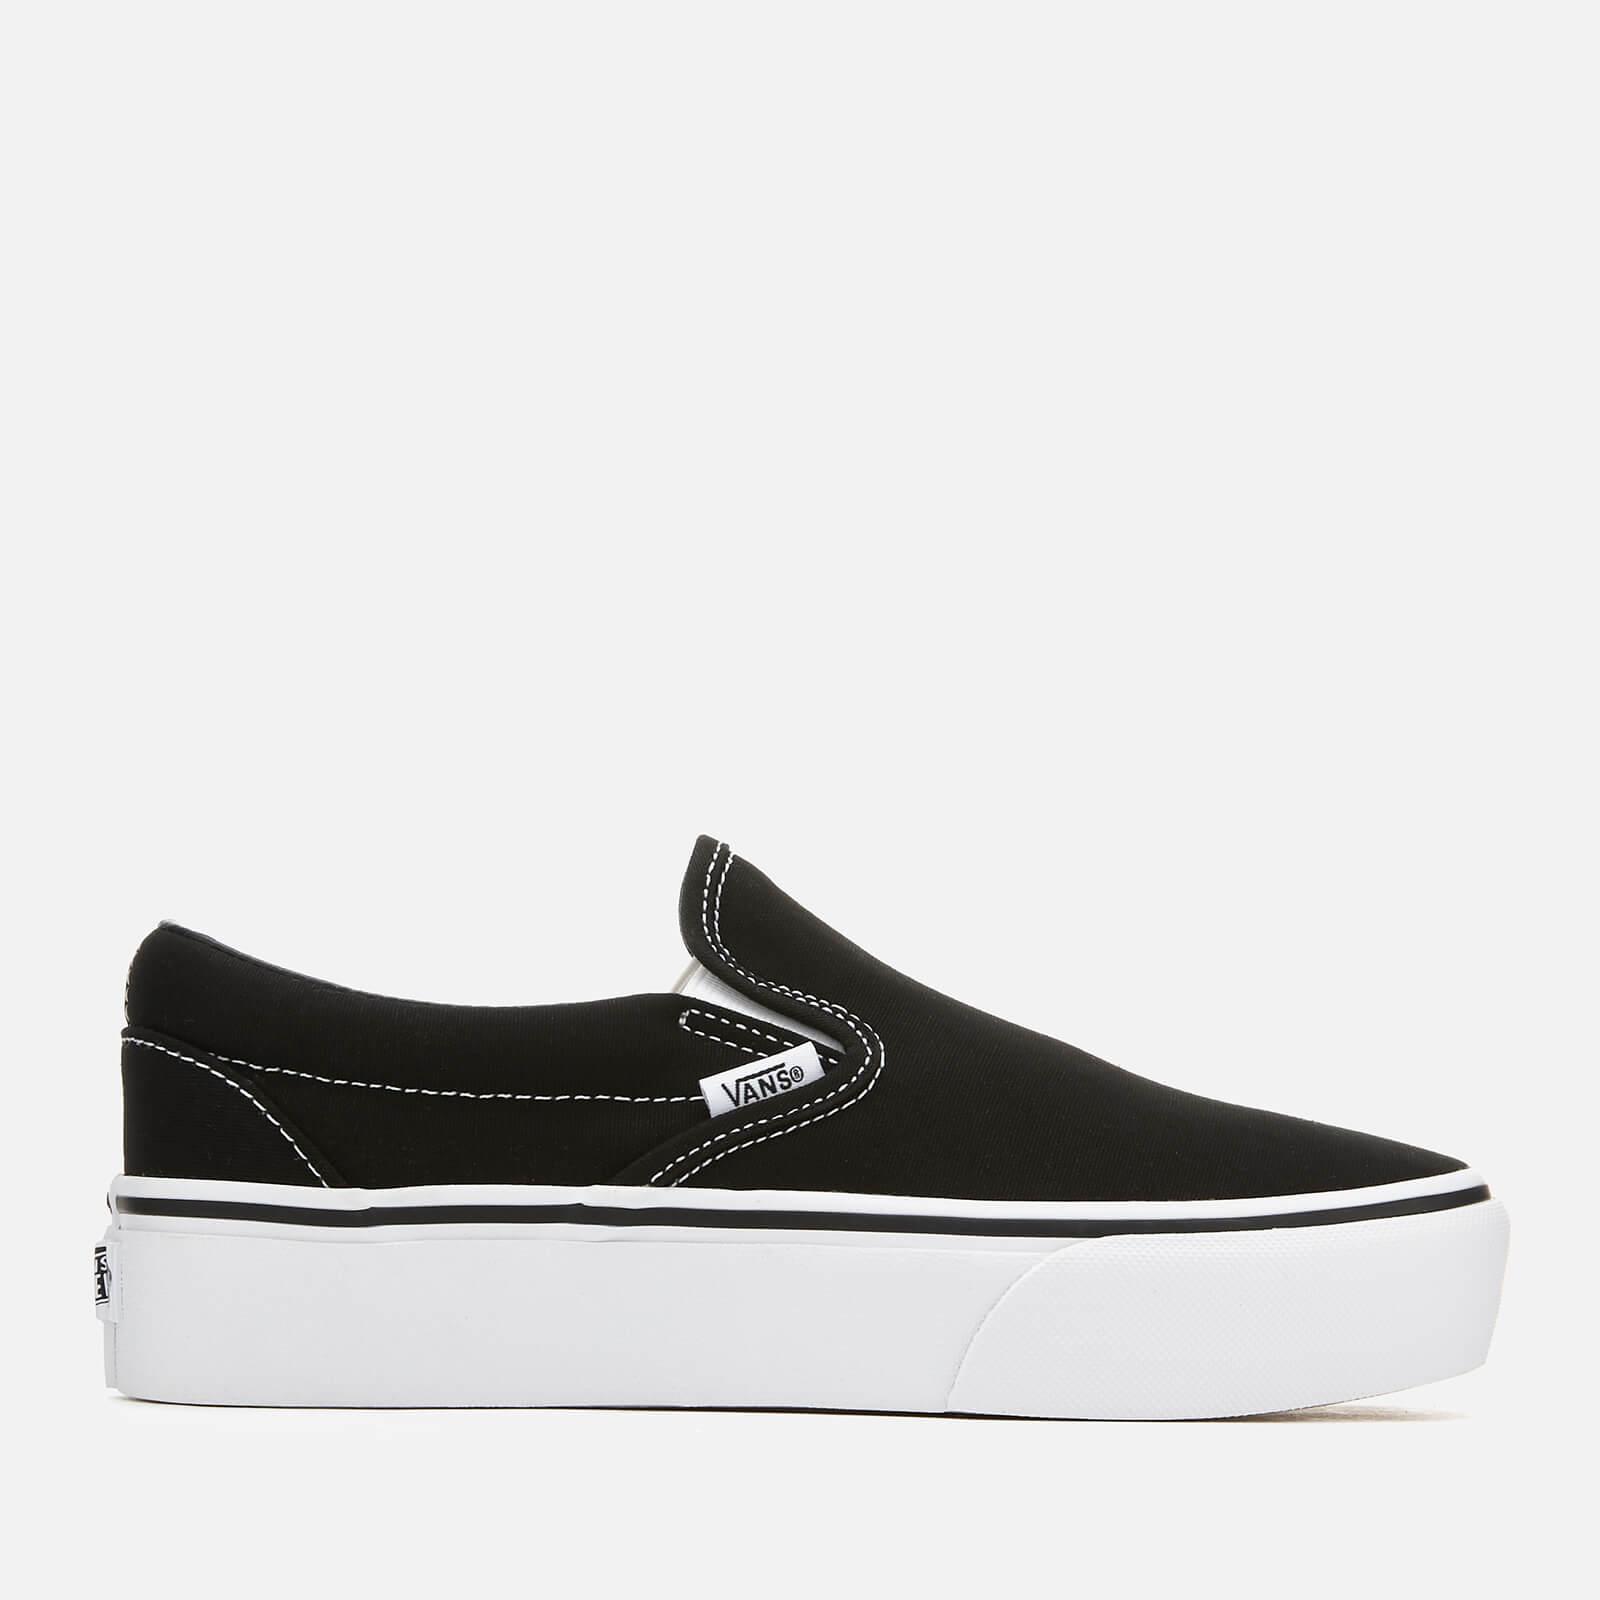 d70594da4689a Vans Women's Classic Platform Slip-On Trainers - Black